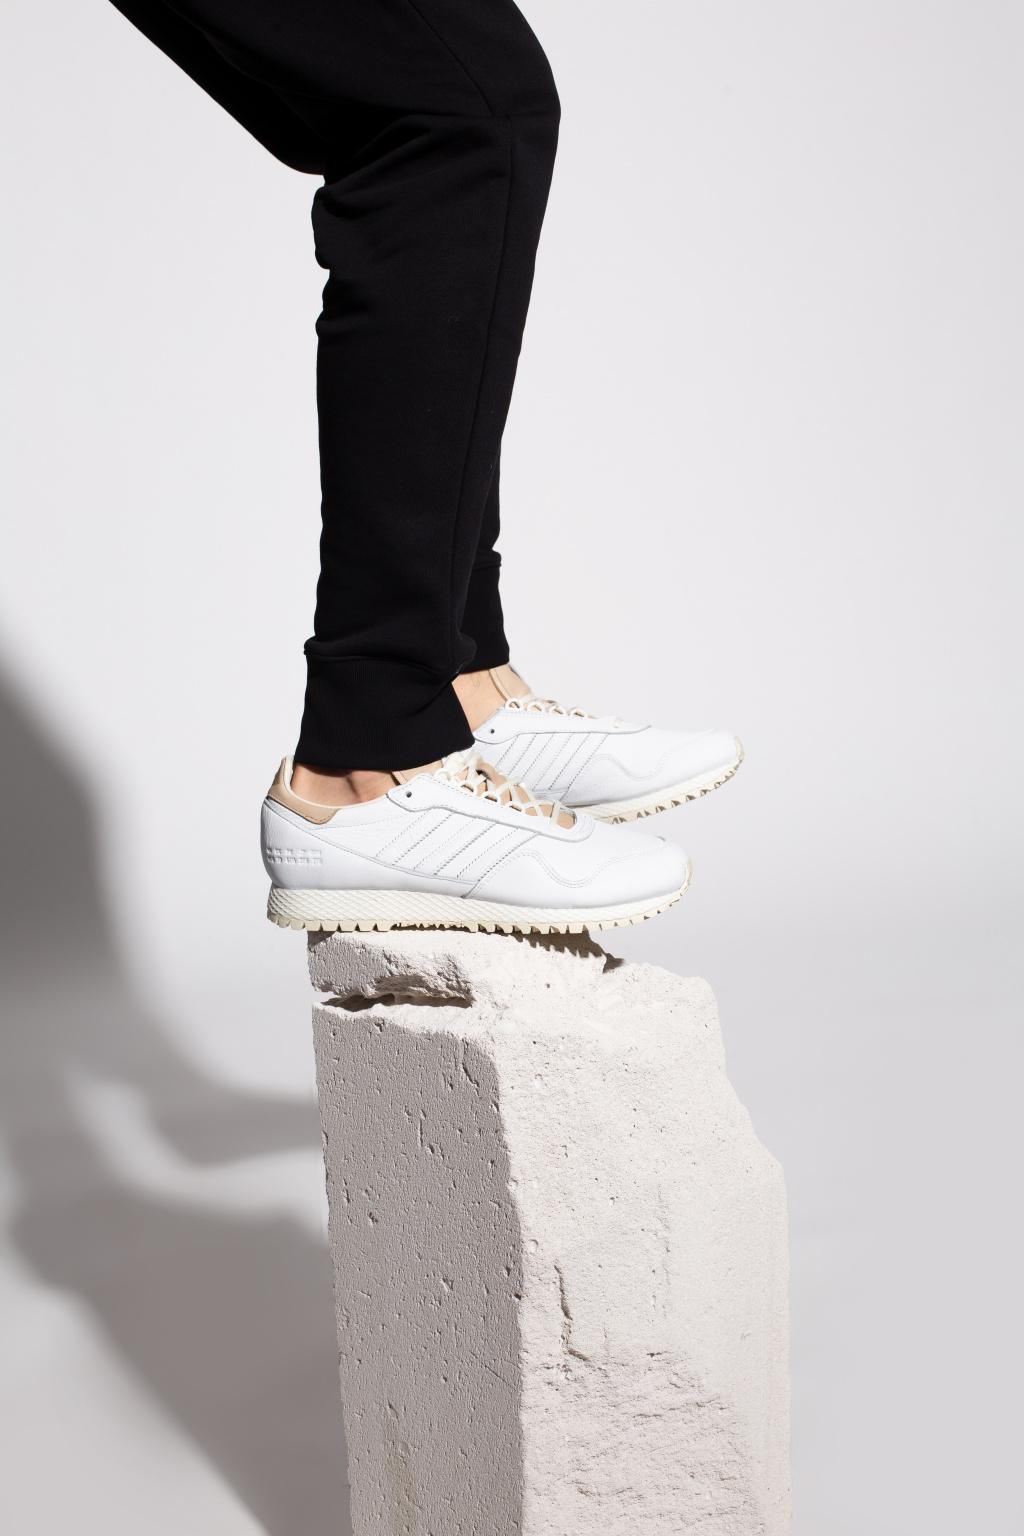 ADIDAS Originals 'New York' sneakers